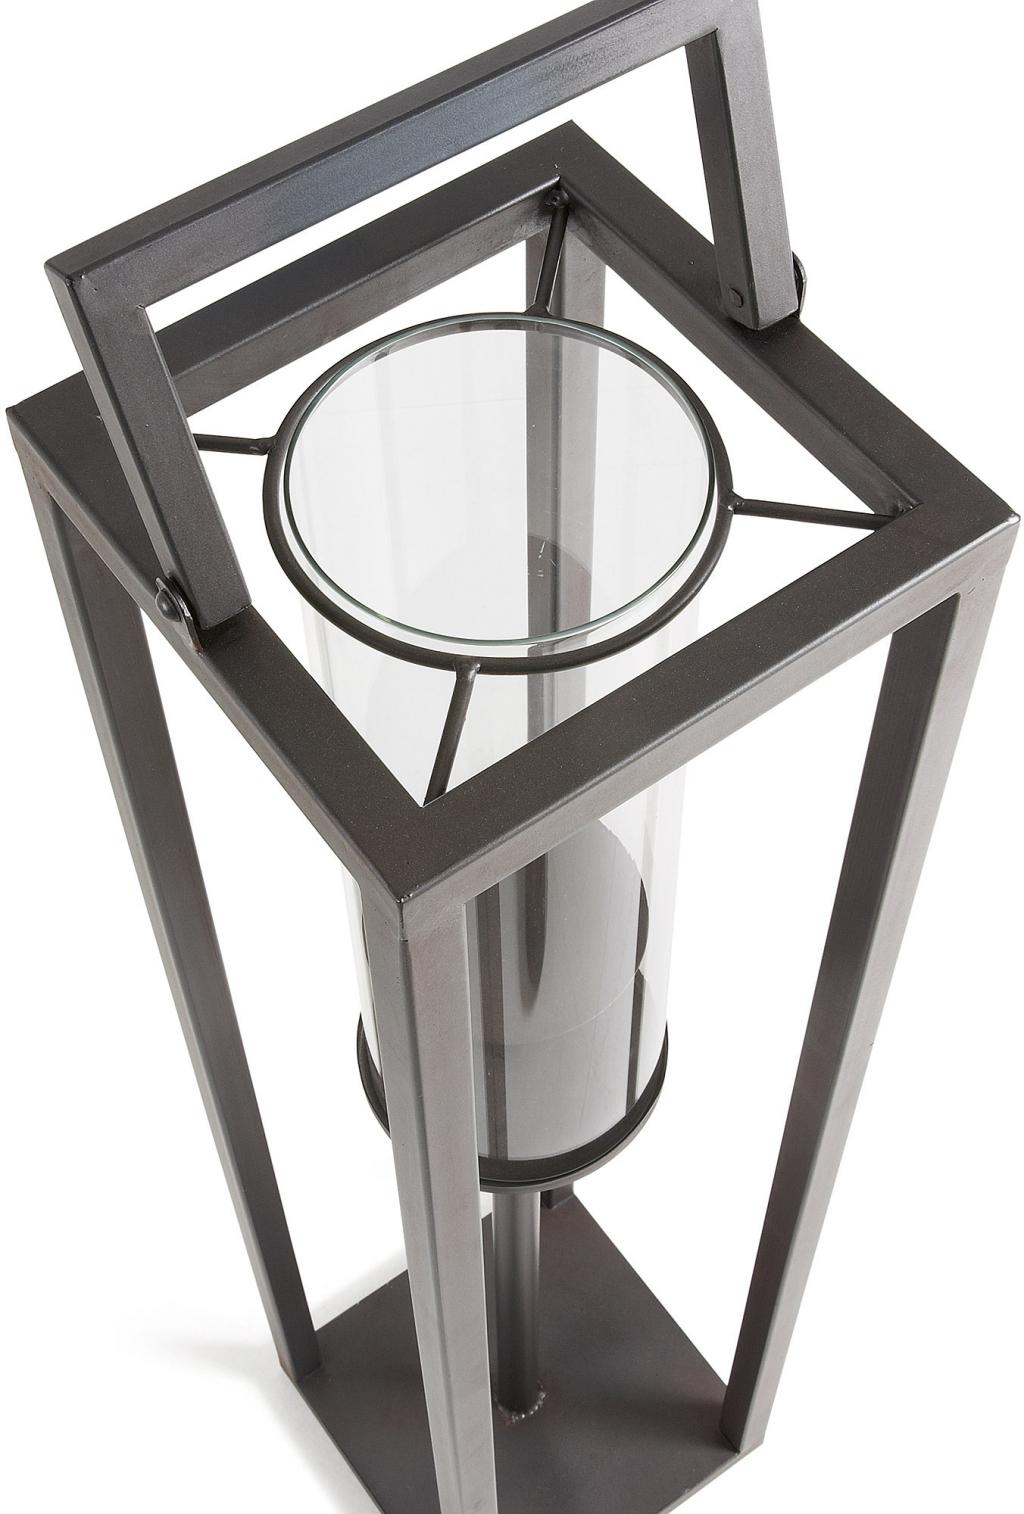 kerzenst nder coastal h 94cm metall schwarz la forma kaufen wohn. Black Bedroom Furniture Sets. Home Design Ideas